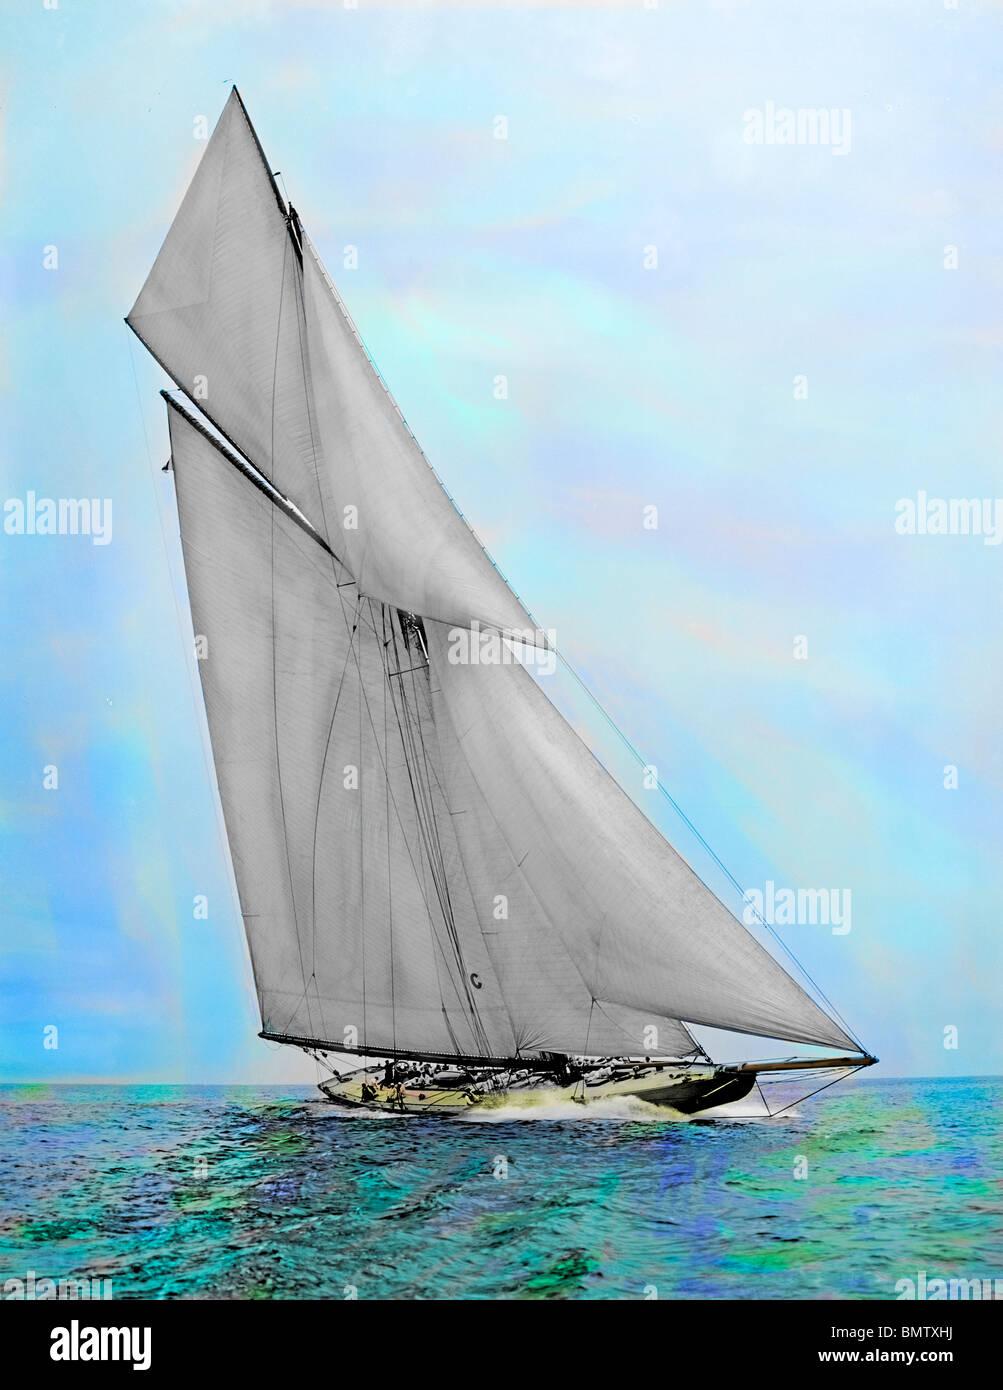 Hand tinted photograph of yacht at full sail - Stock Image